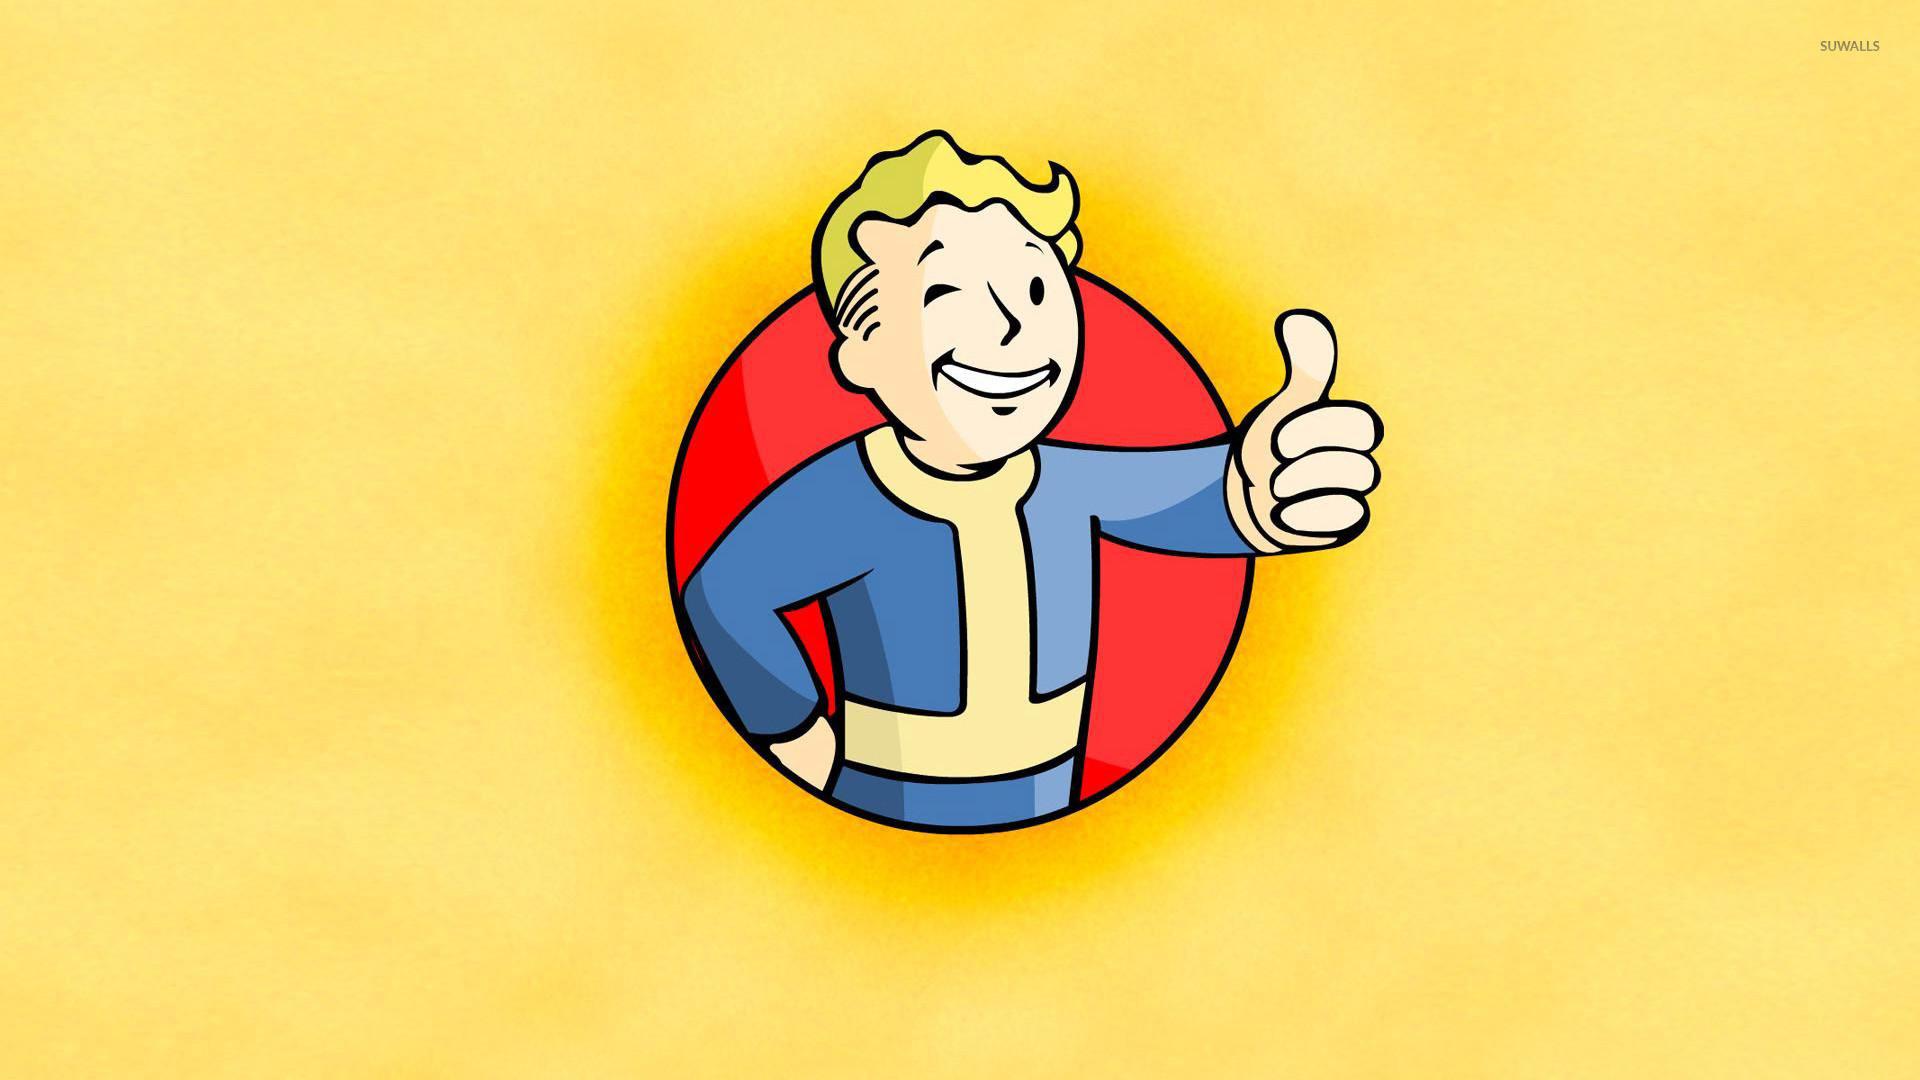 Vault Boy – Fallout [4] wallpaper – Game wallpapers – #27630